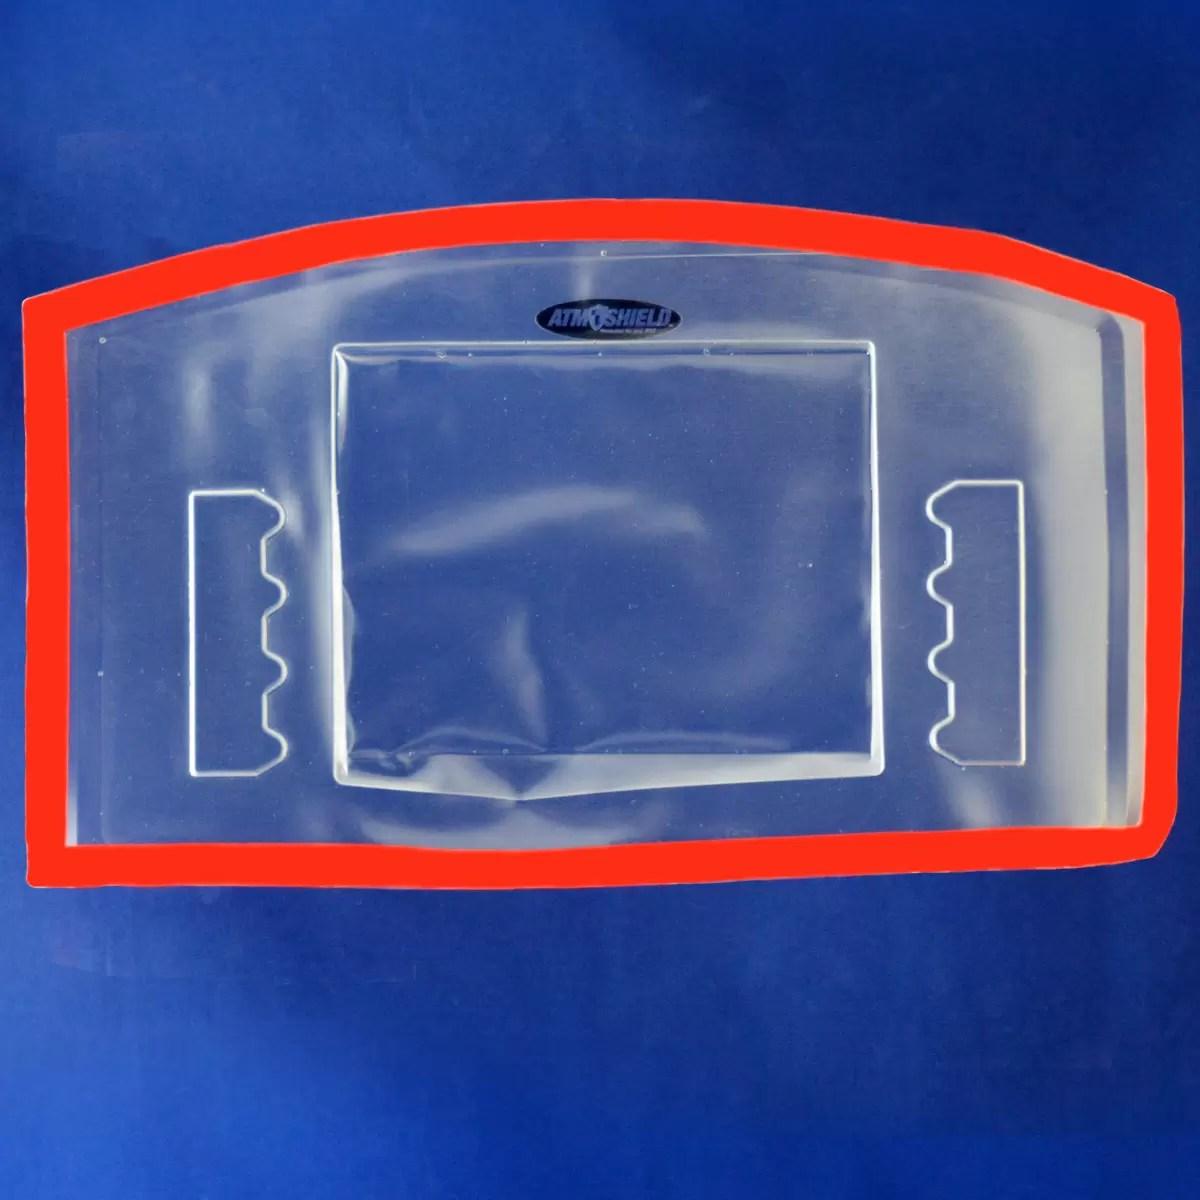 ATM Shield Screen